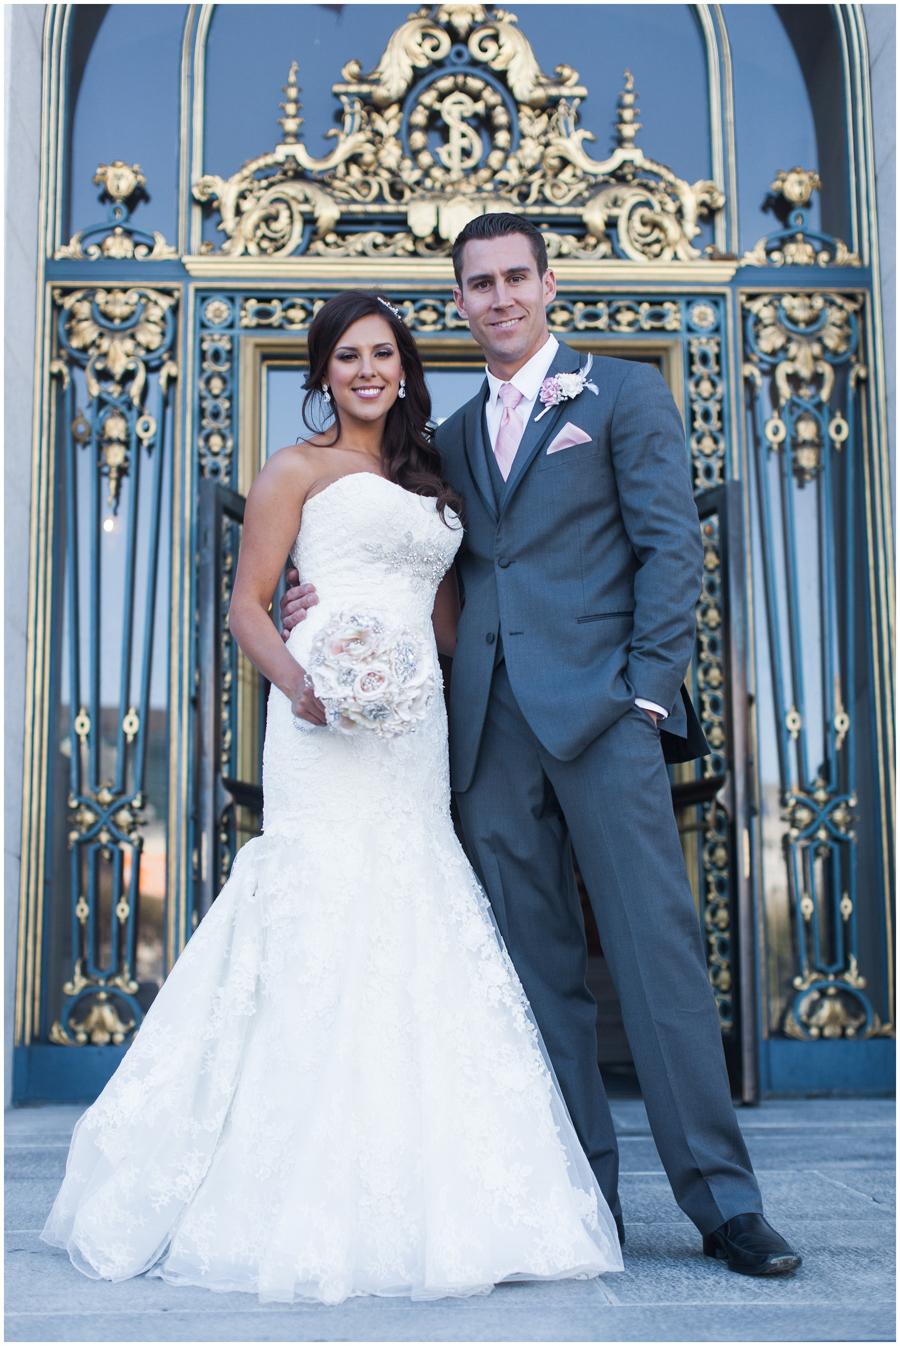 San_Francisco_City_Hall_Wedding_Shawna_Bret_16.jpg